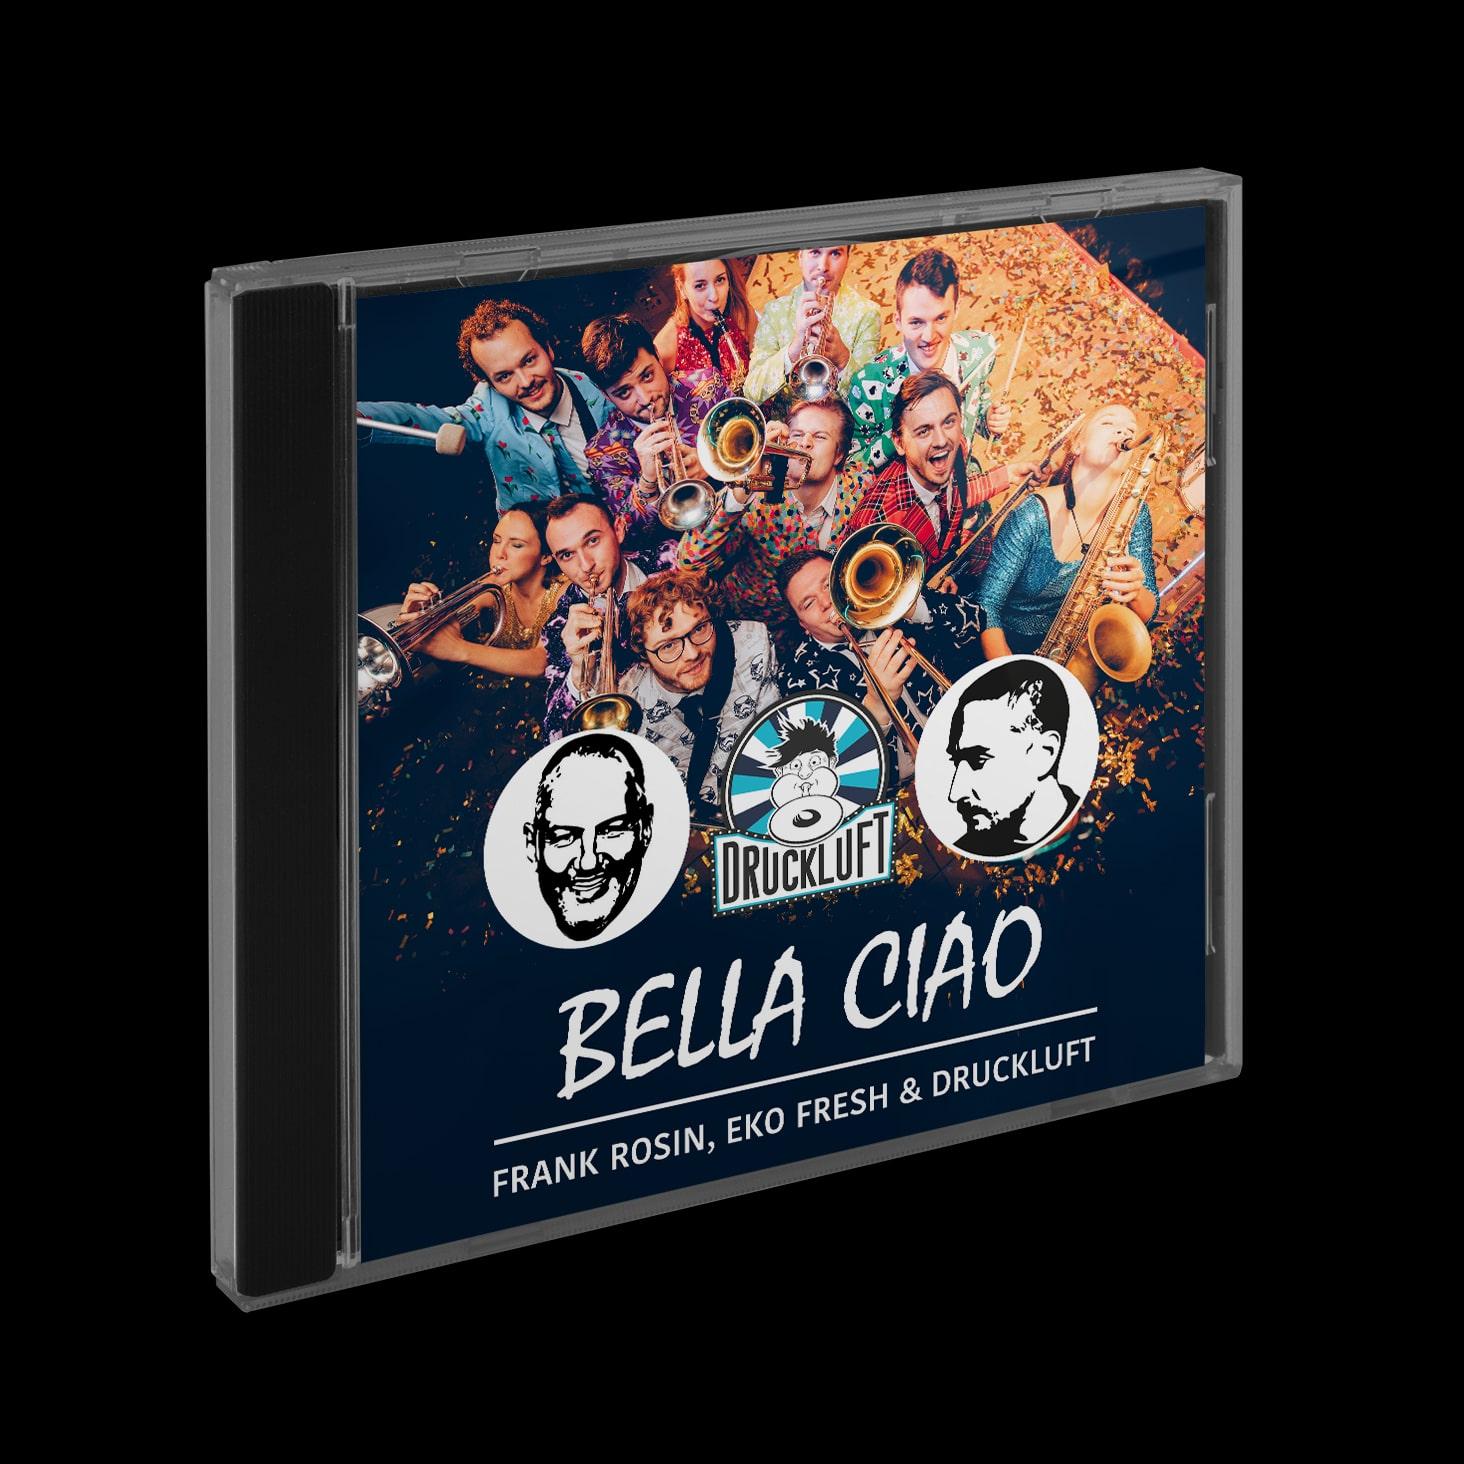 cd_cover_frank_rosin_bella_ciao